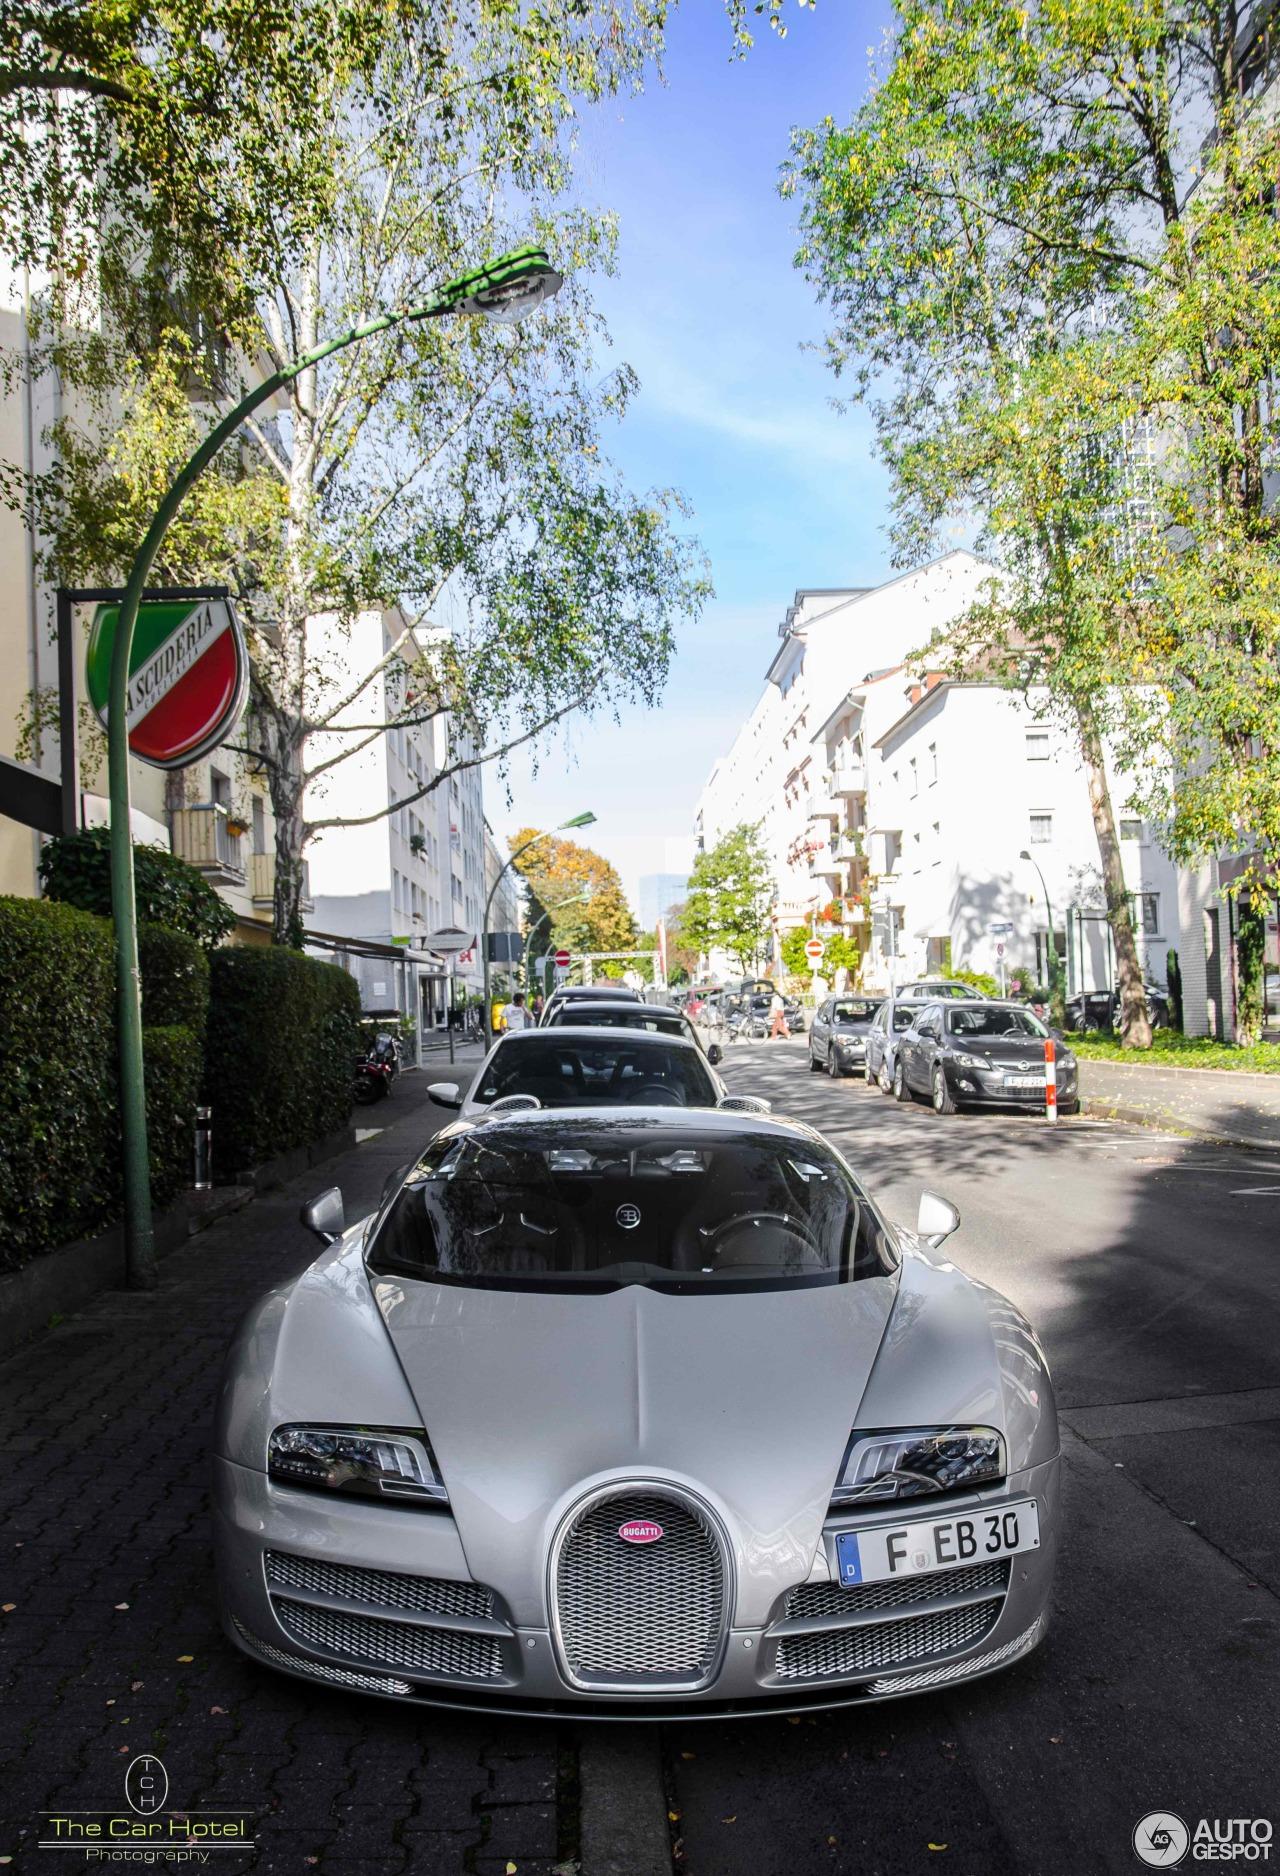 bugatti veyron 16 4 grand sport vitesse 19 october 2014. Black Bedroom Furniture Sets. Home Design Ideas